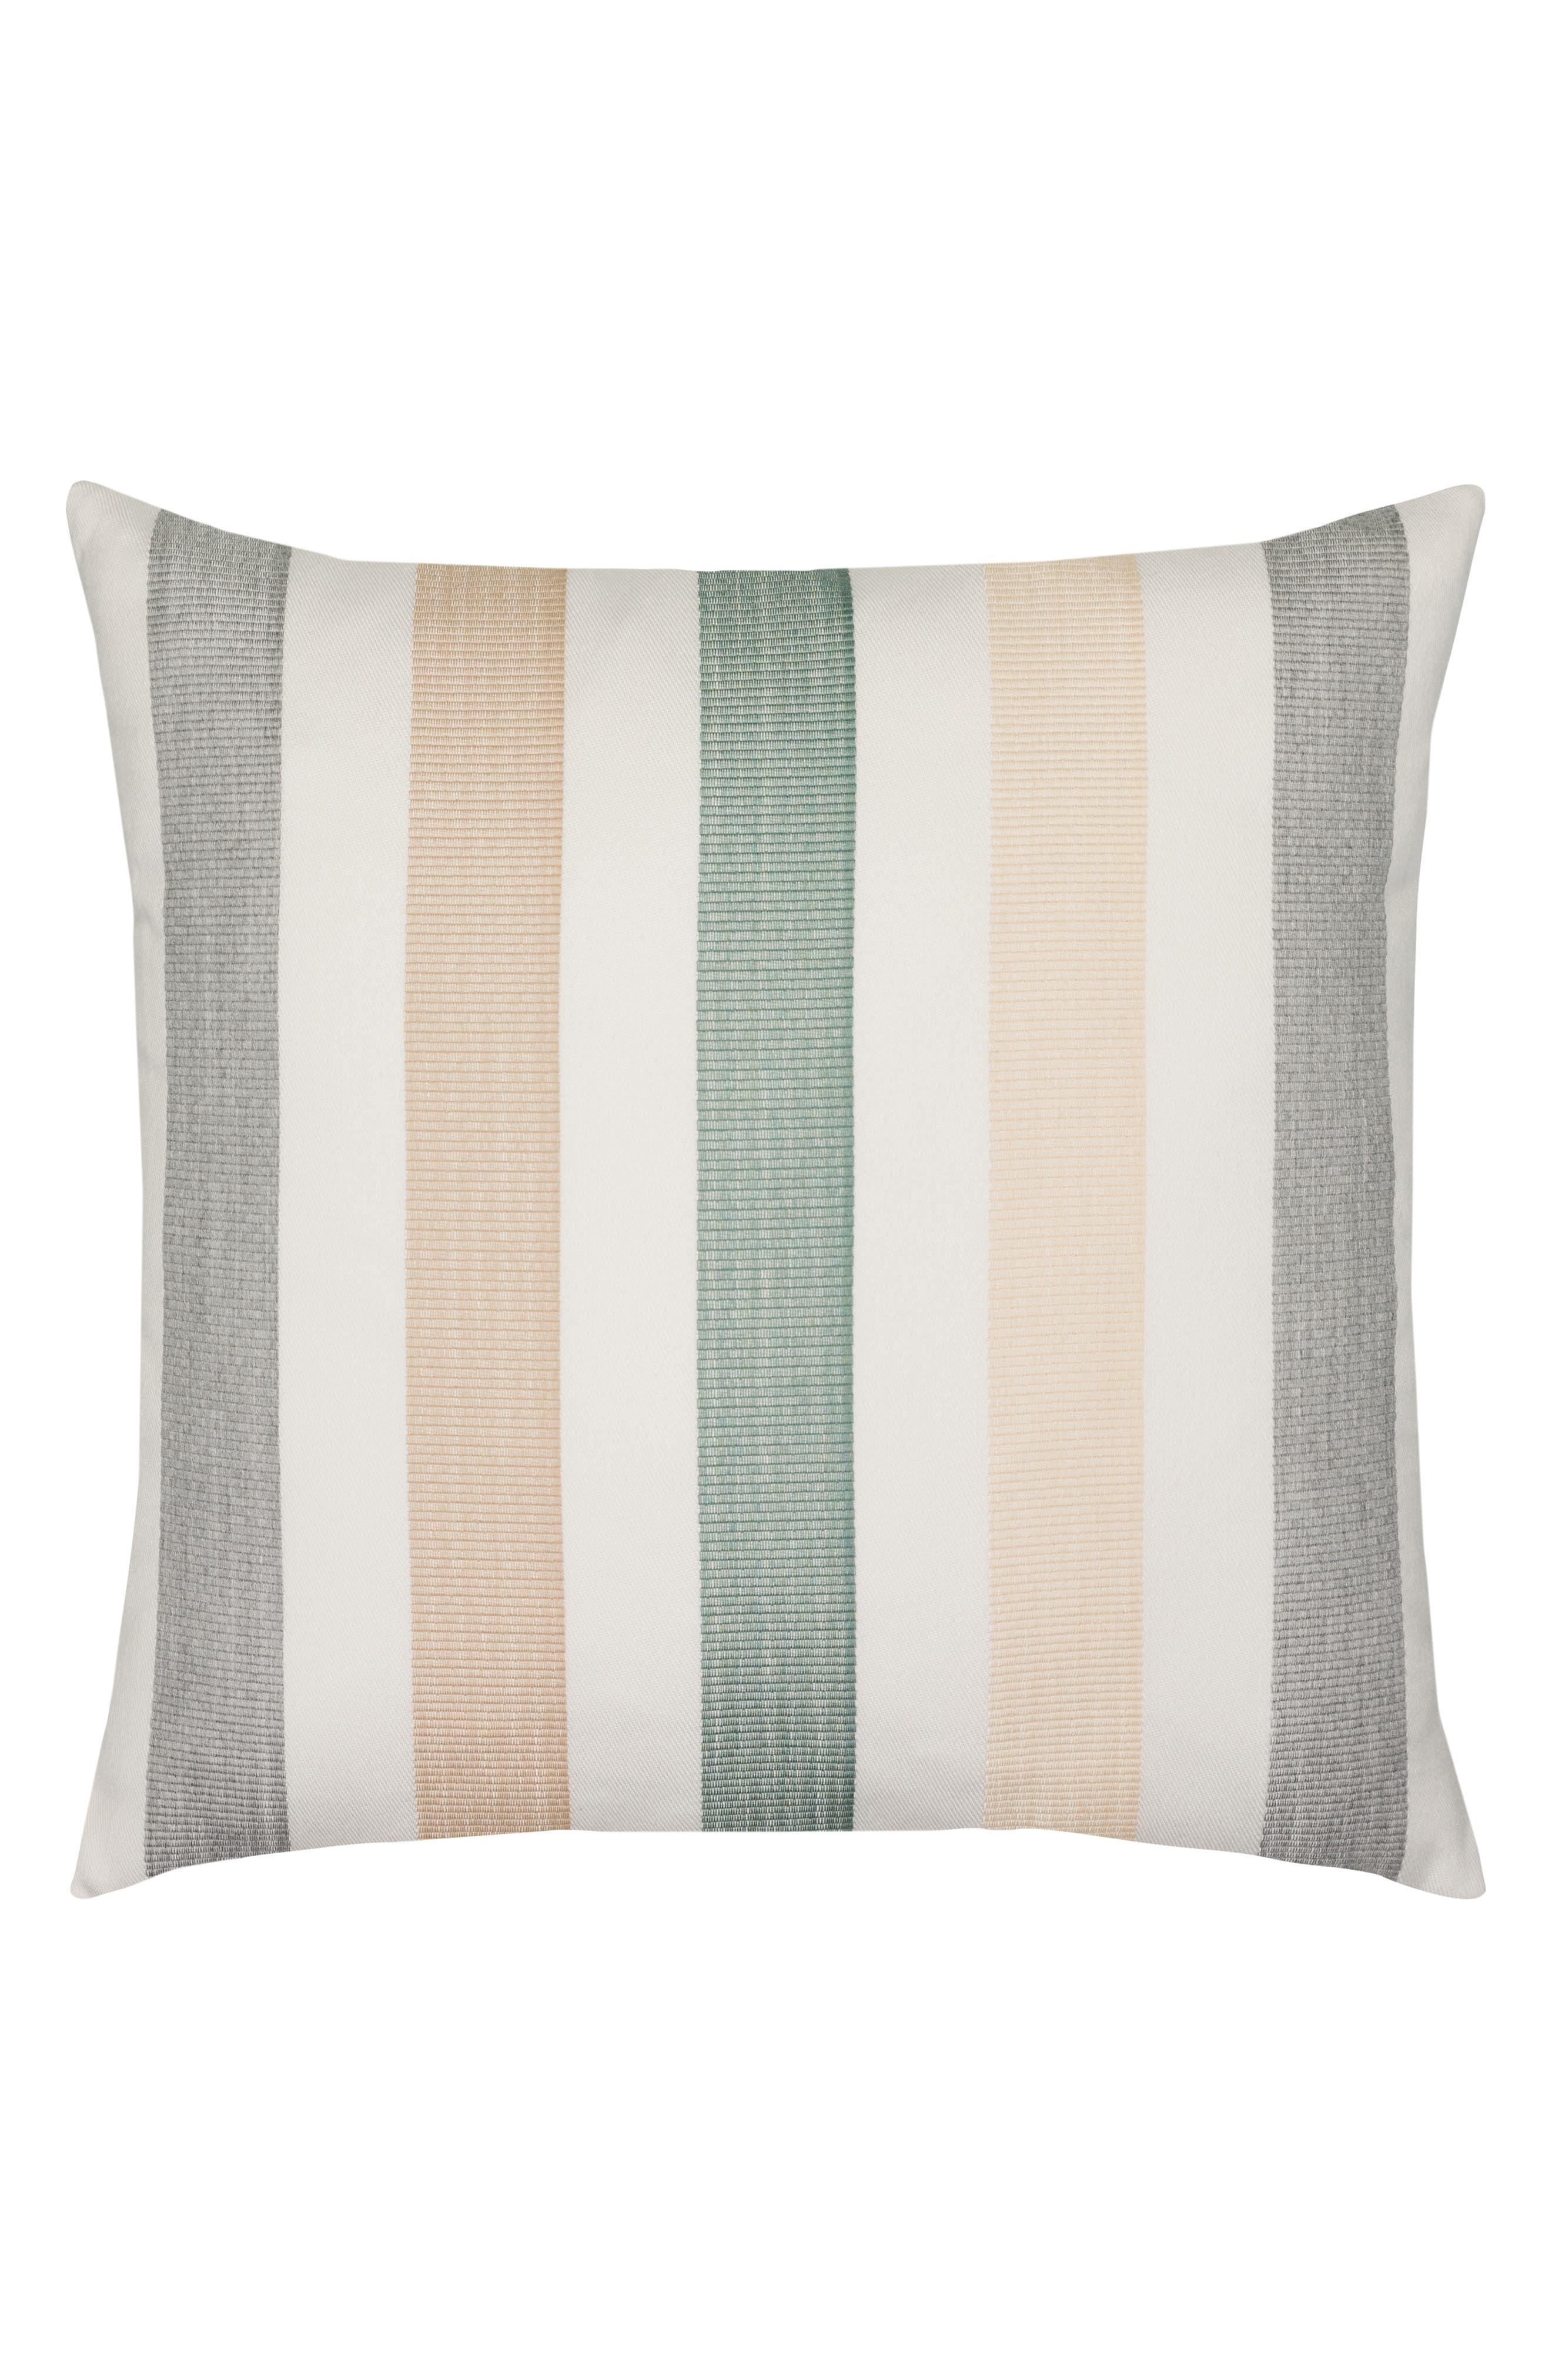 ELAINE SMITH Axiom Indoor/Outdoor Accent Pillow, Main, color, GRAY MULTI